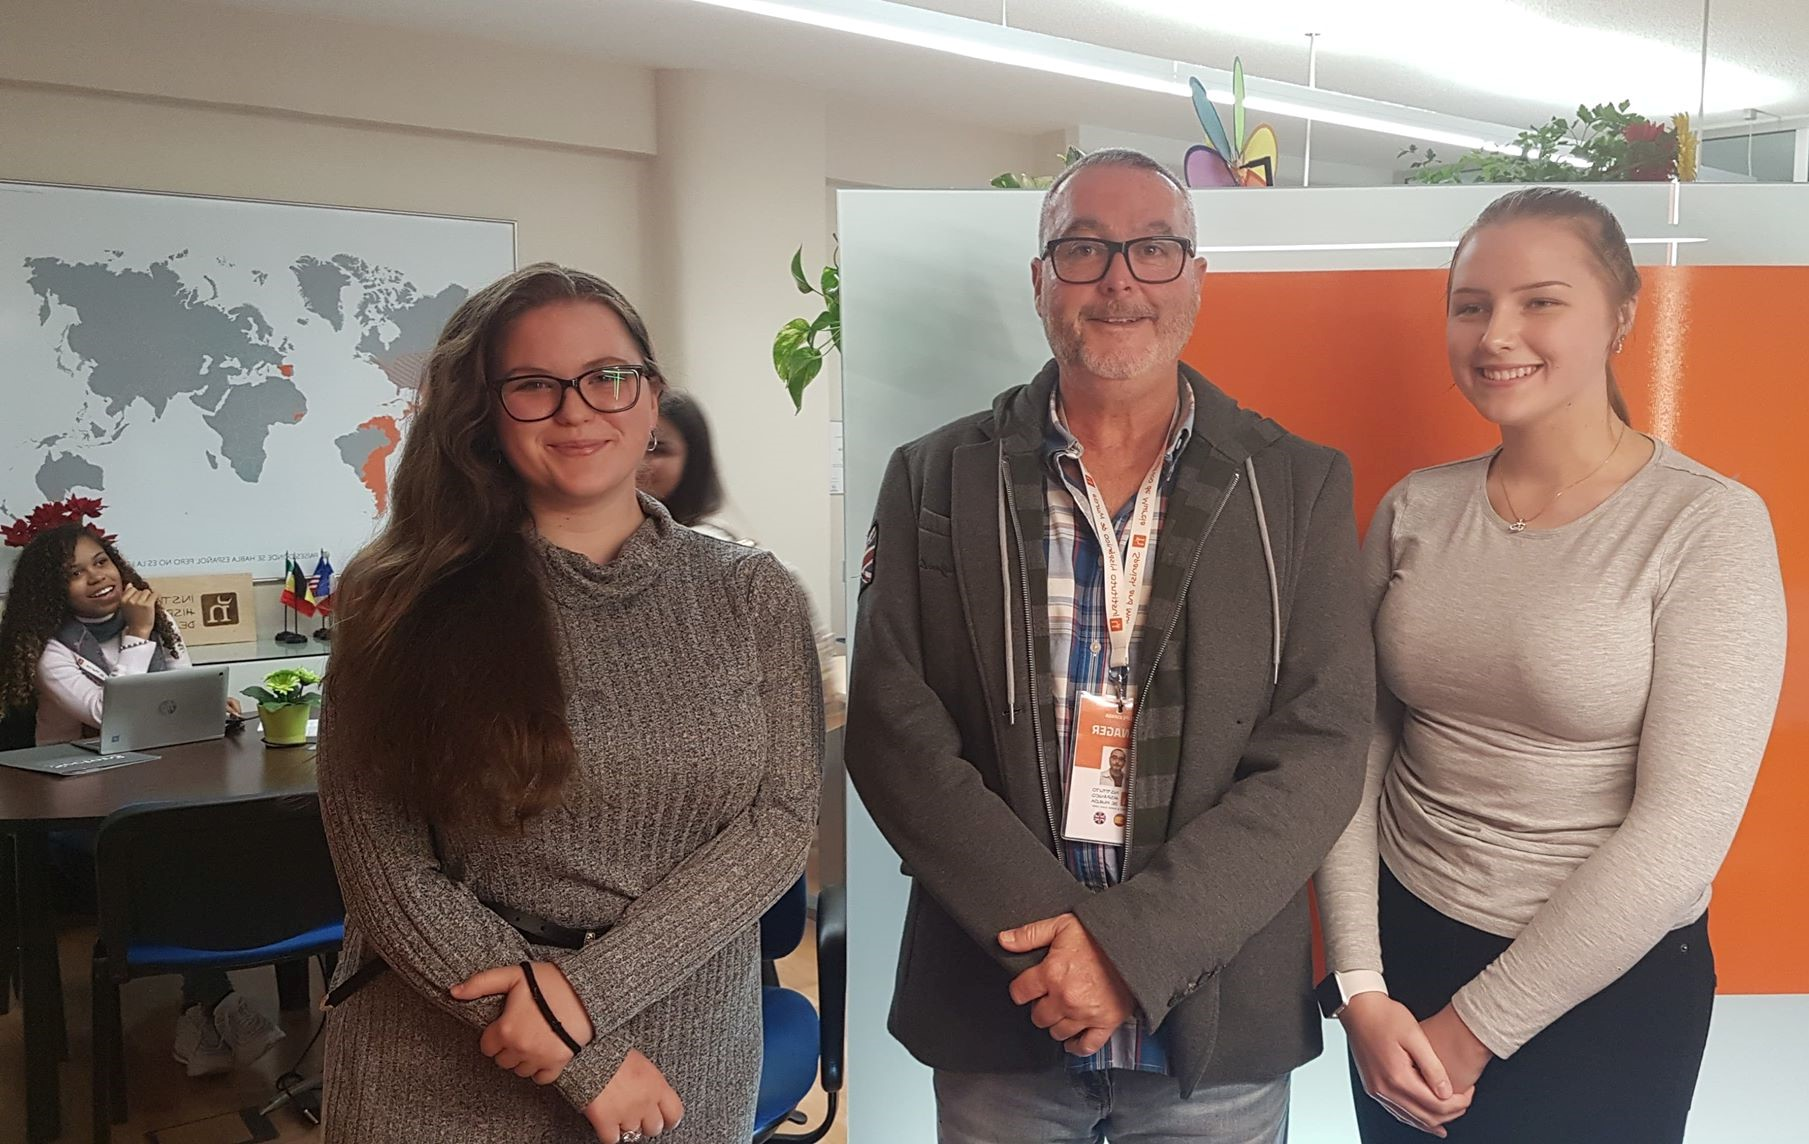 1 Instituto Hispanico de Murcia Lise Fure Håvik , Felipe Espada (manager) og Lucia Trvalcova.jpg